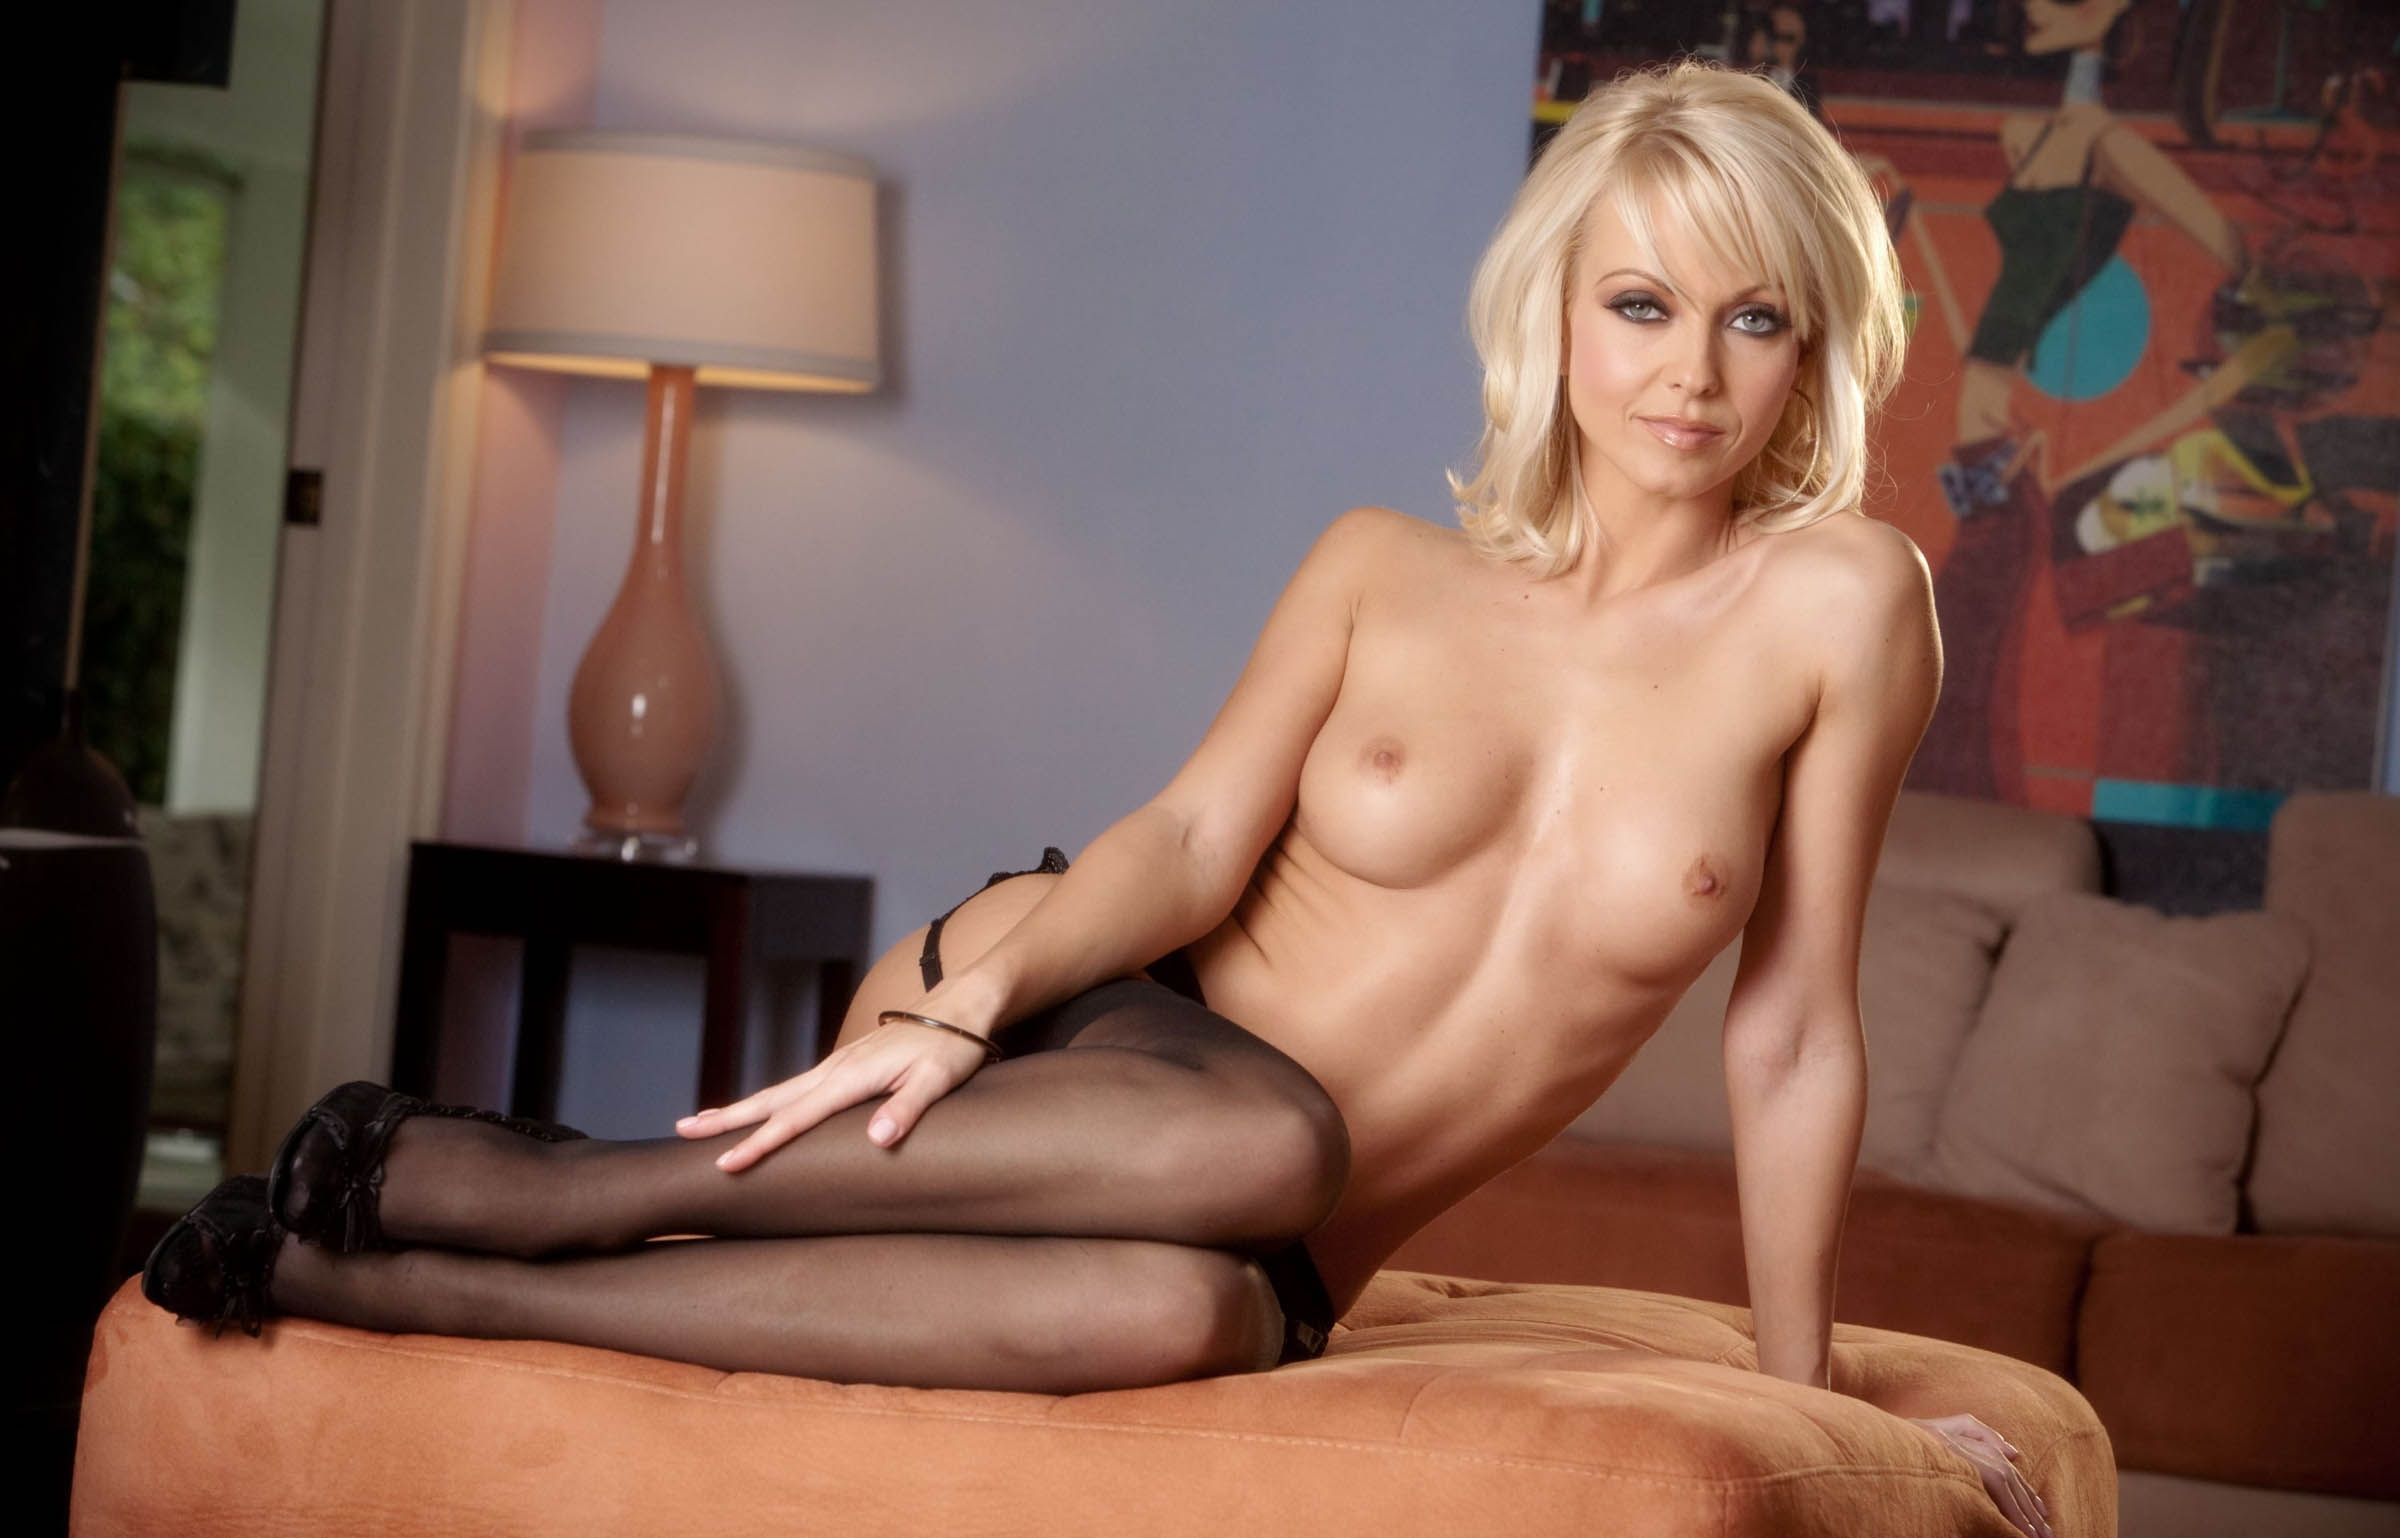 golie-blondinki-v-vozraste